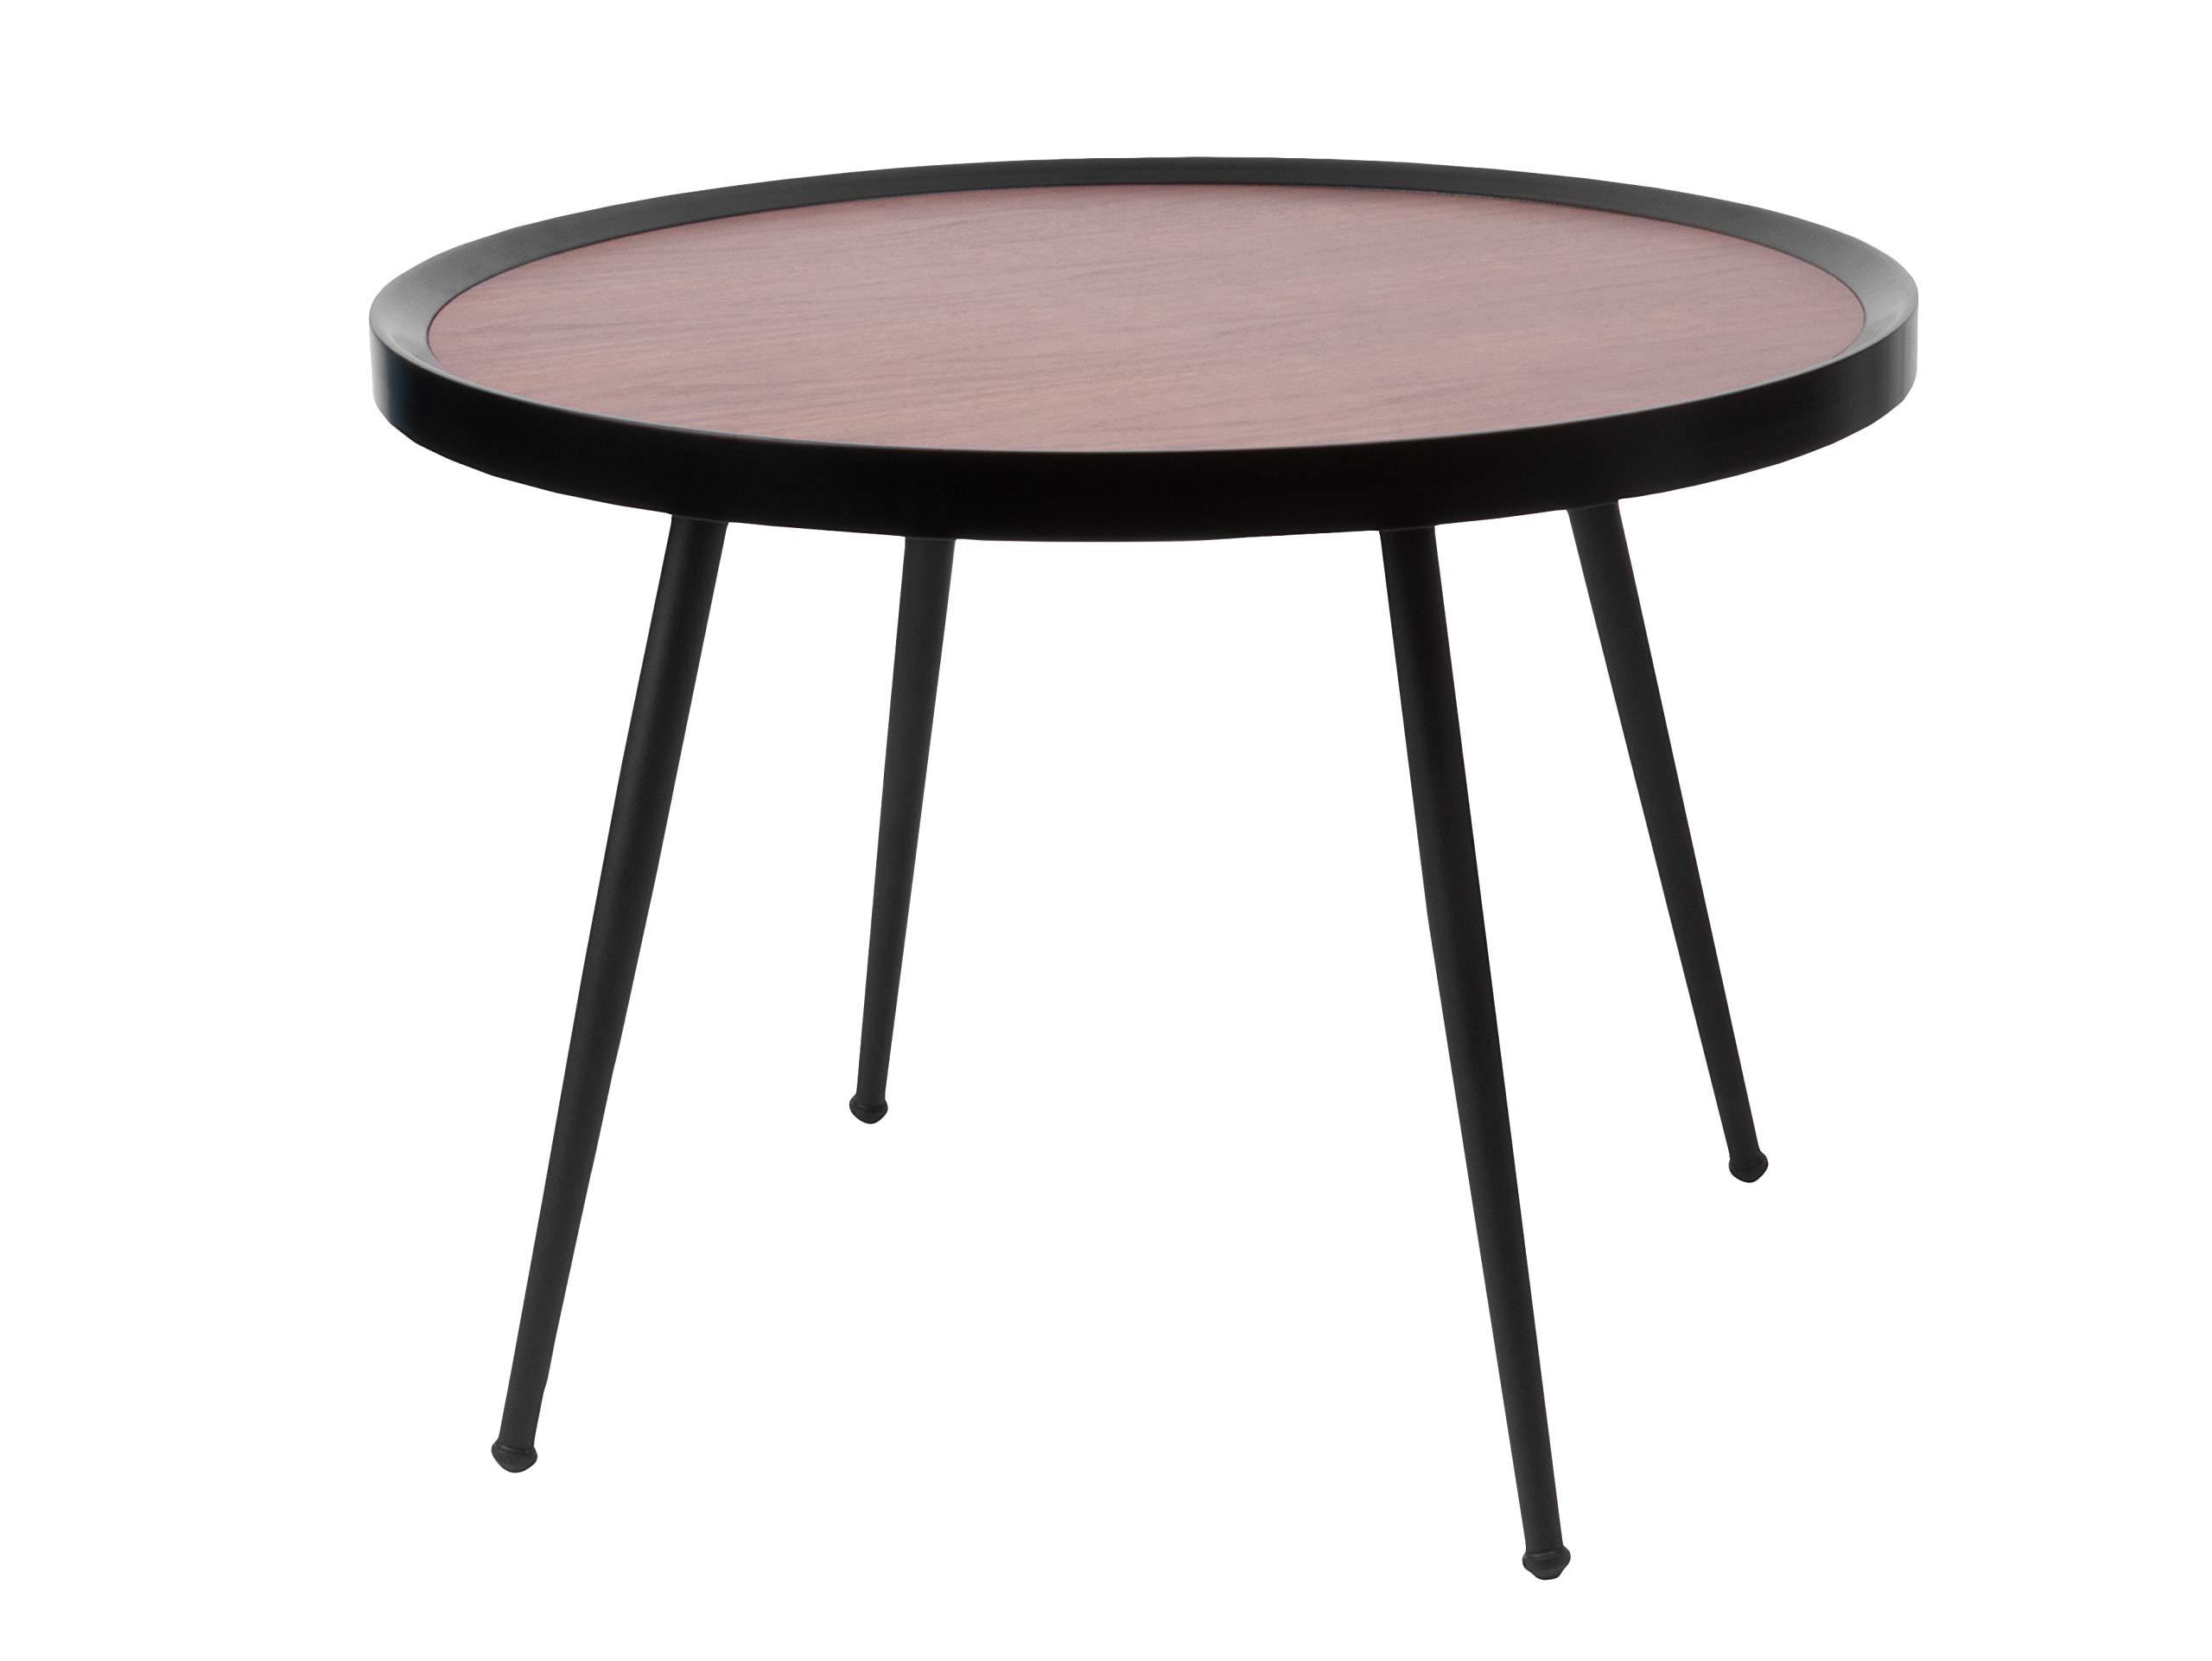 Versa 10850130 Tavolino in metallo nero 45 cm